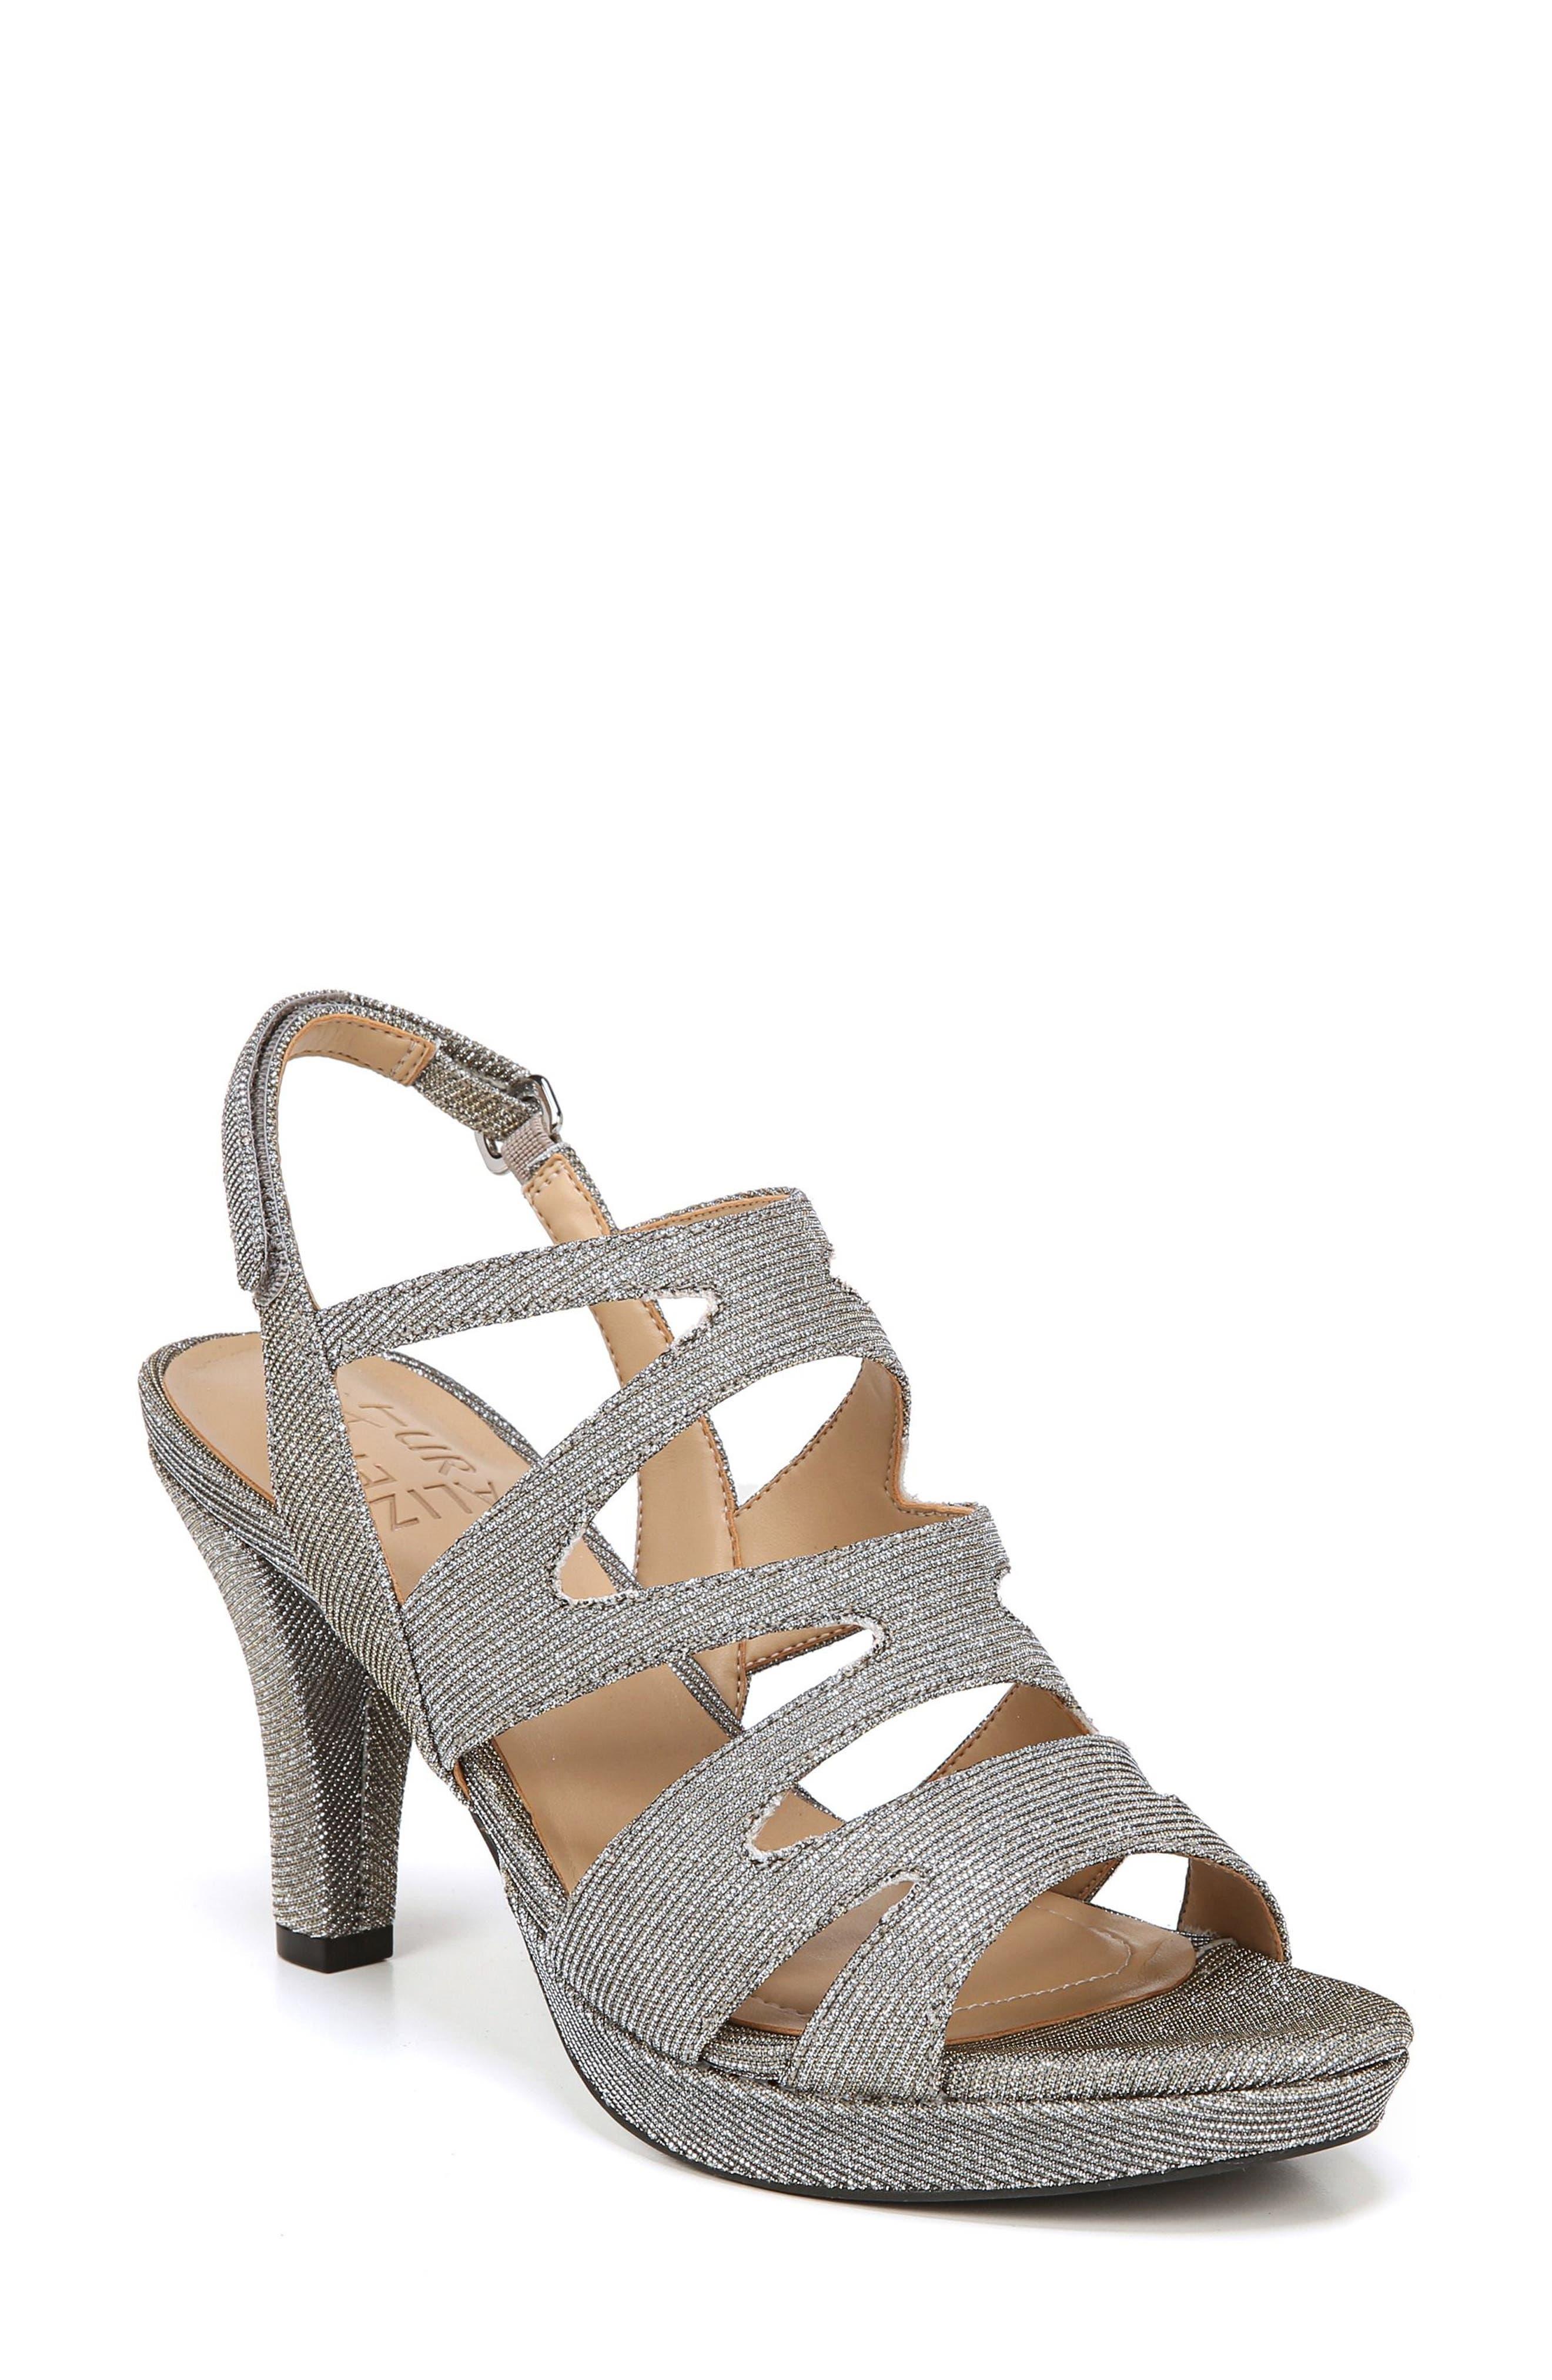 'Pressley' Slingback Platform Sandal,                         Main,                         color, Alloy Sparkle Fabric